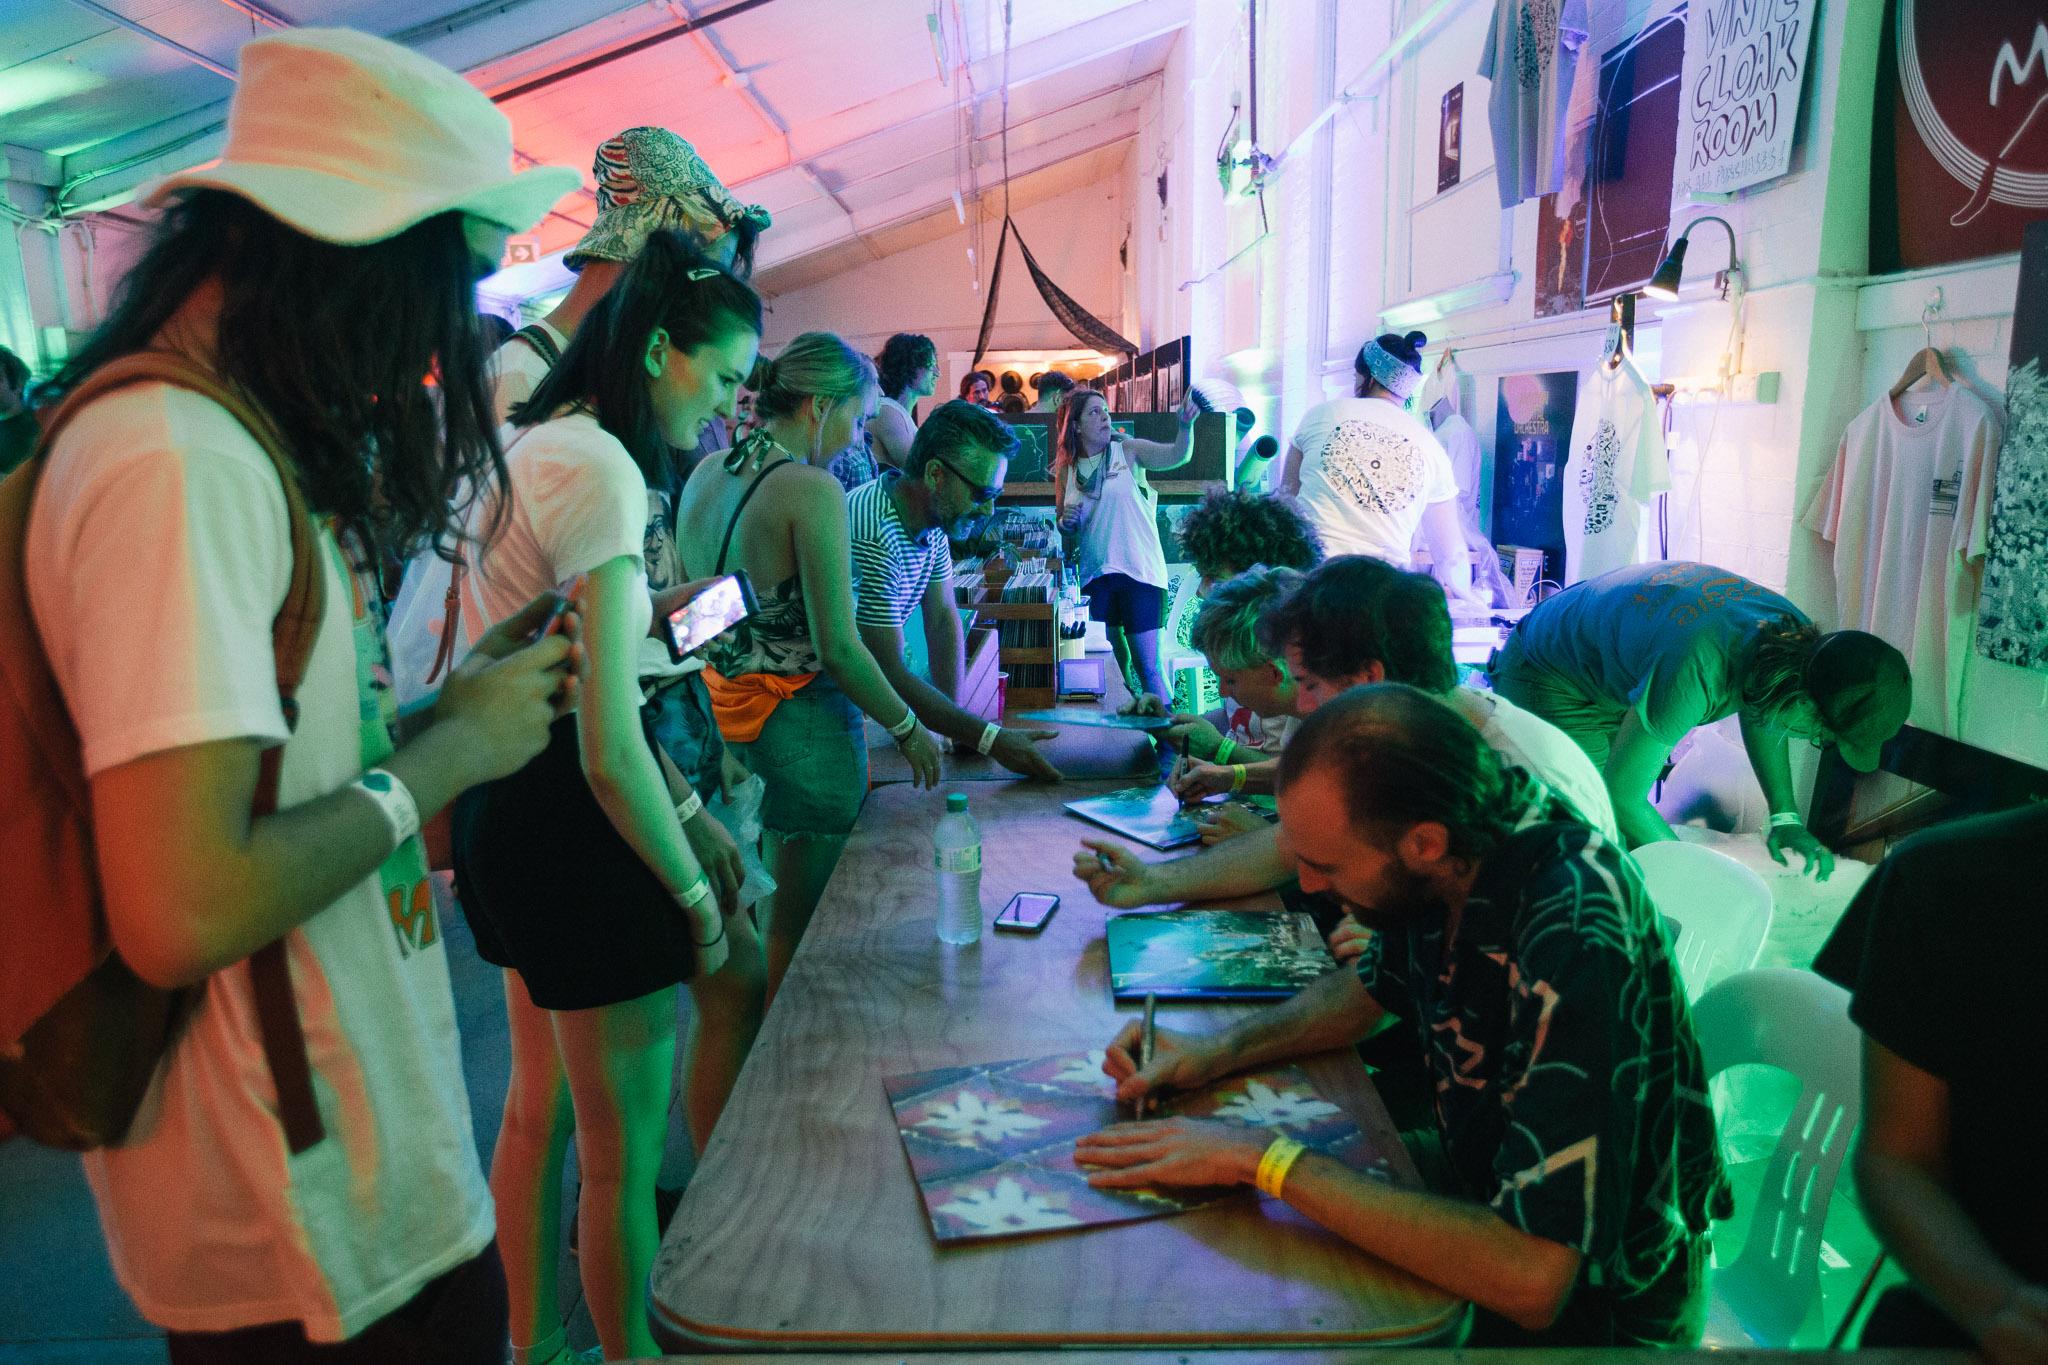 Atmosphere_Laneway-Festival-Brisbane-2018_Credit-Bianca-Holderness-83.jpg